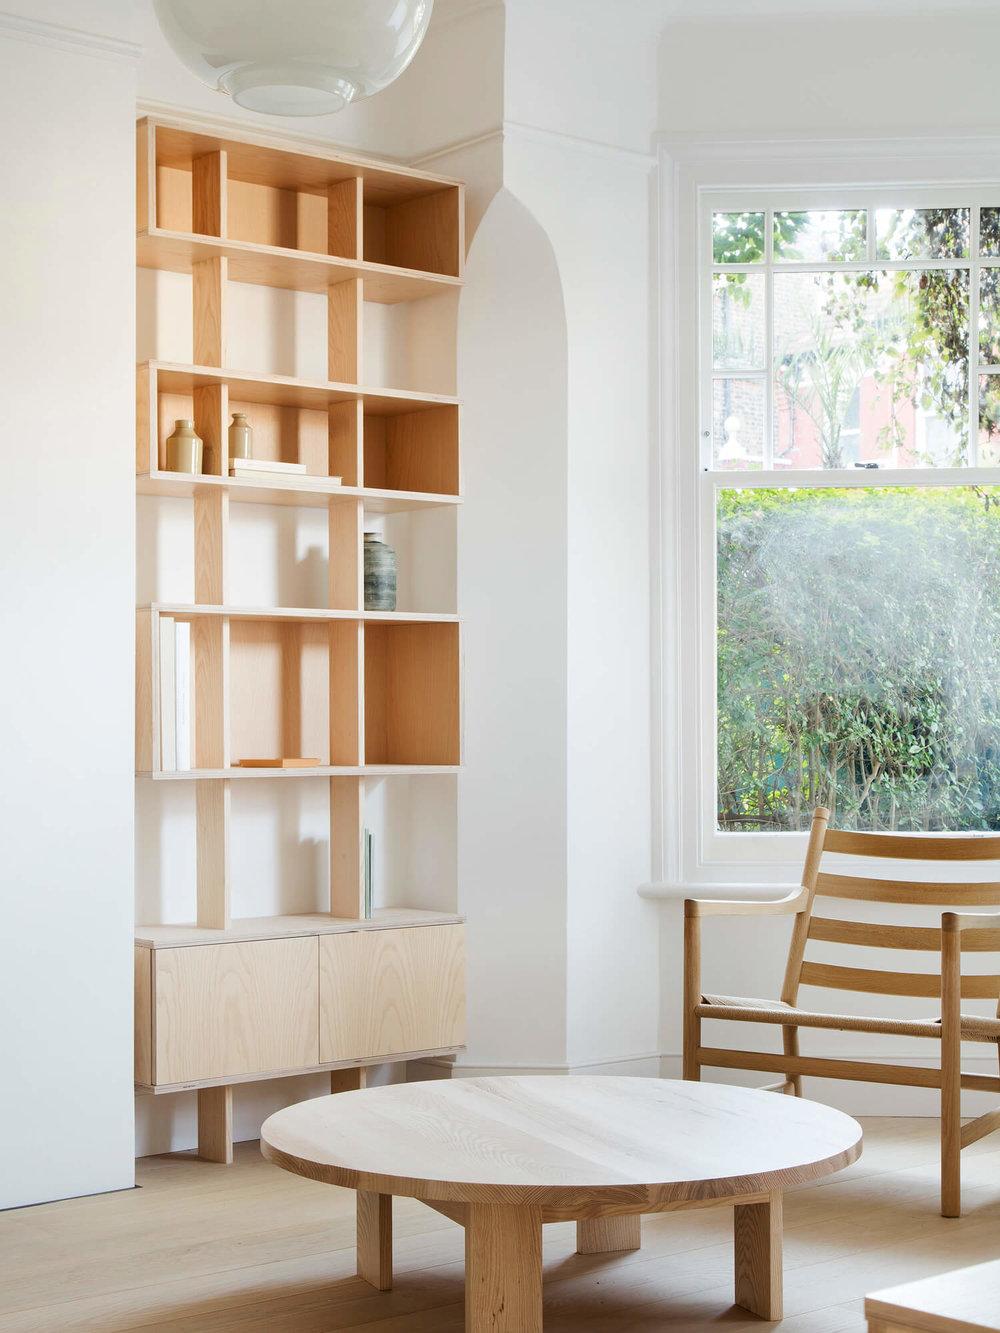 est-living-dewsbury-road-o-sullivan-architects-05.jpg